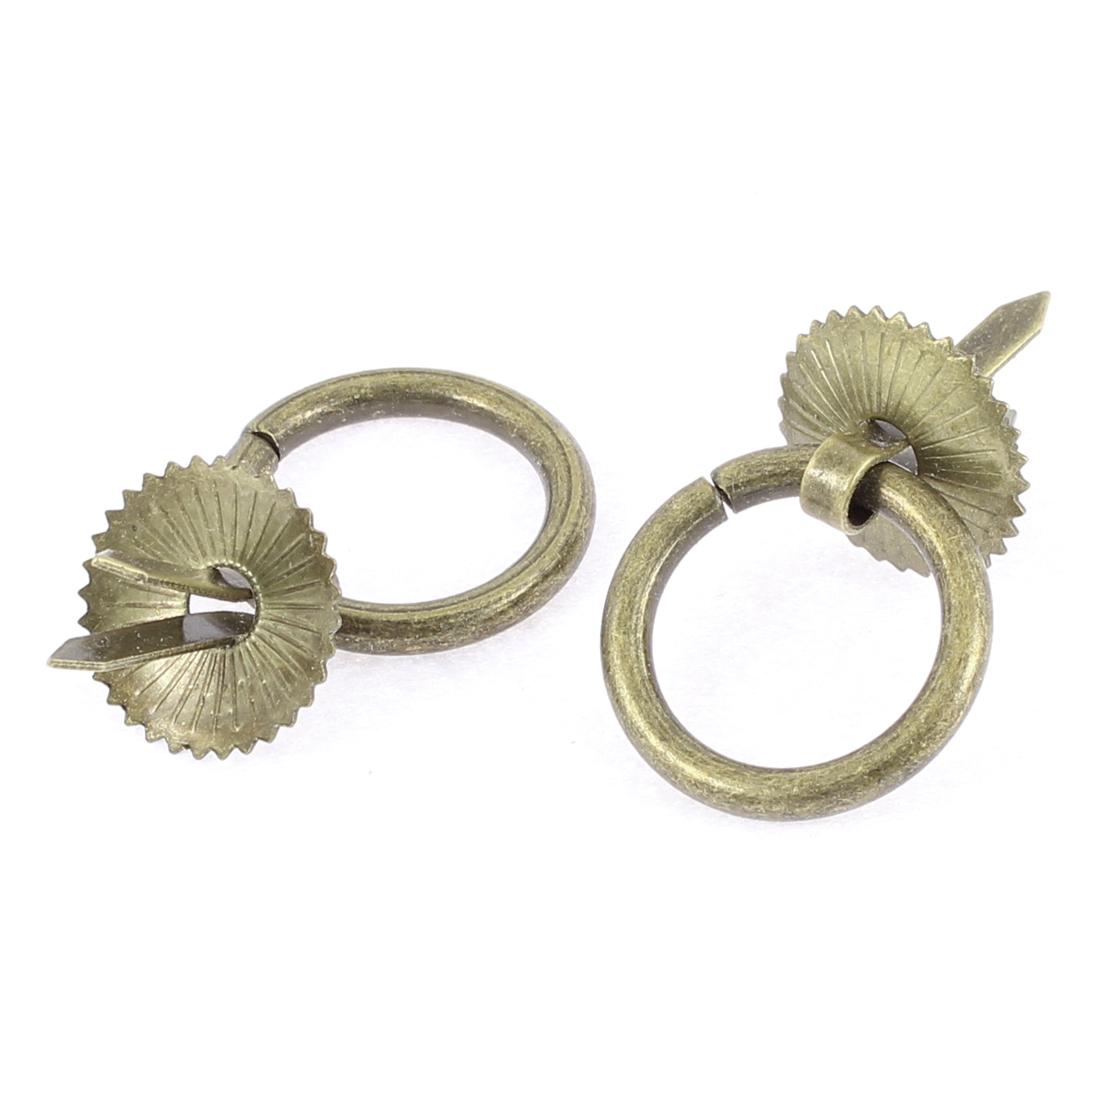 Drawer Closet Door Dresser Round Shaped Pull Handle Ring Bronze Tone 2 PCS